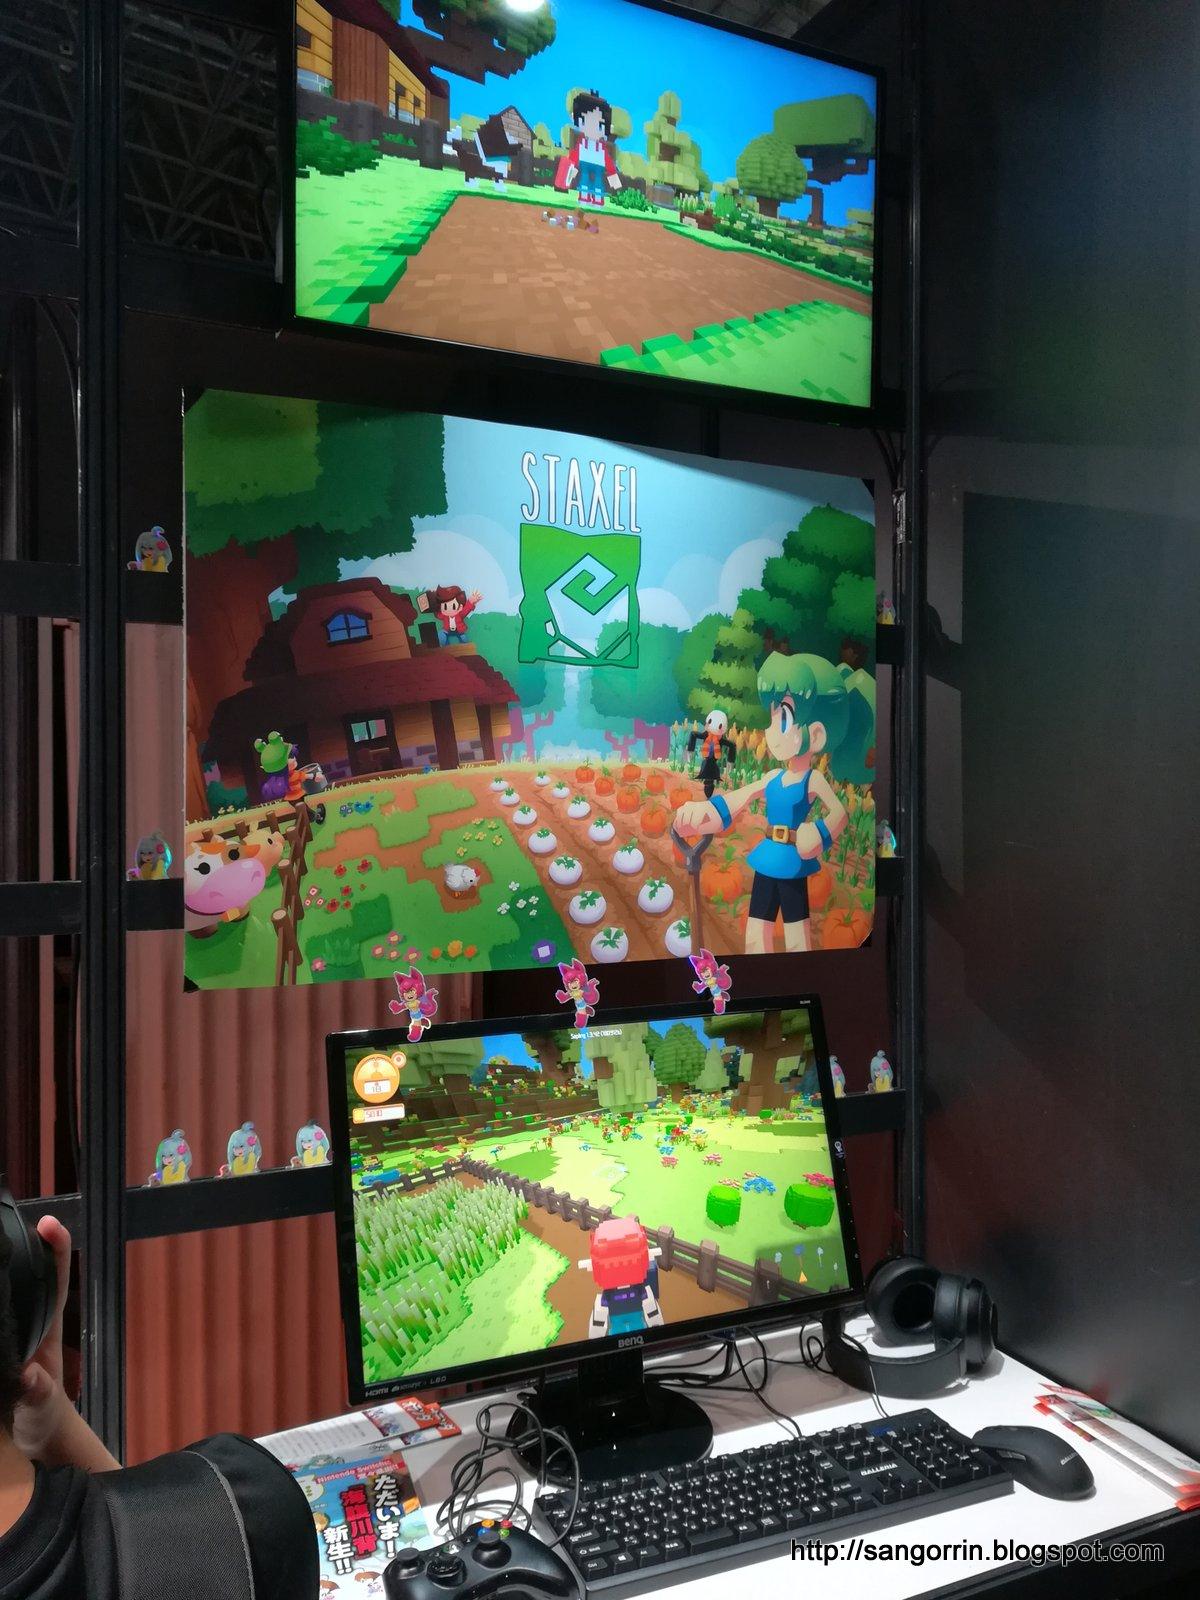 Sangorrin: Tokyo Game Show 2018